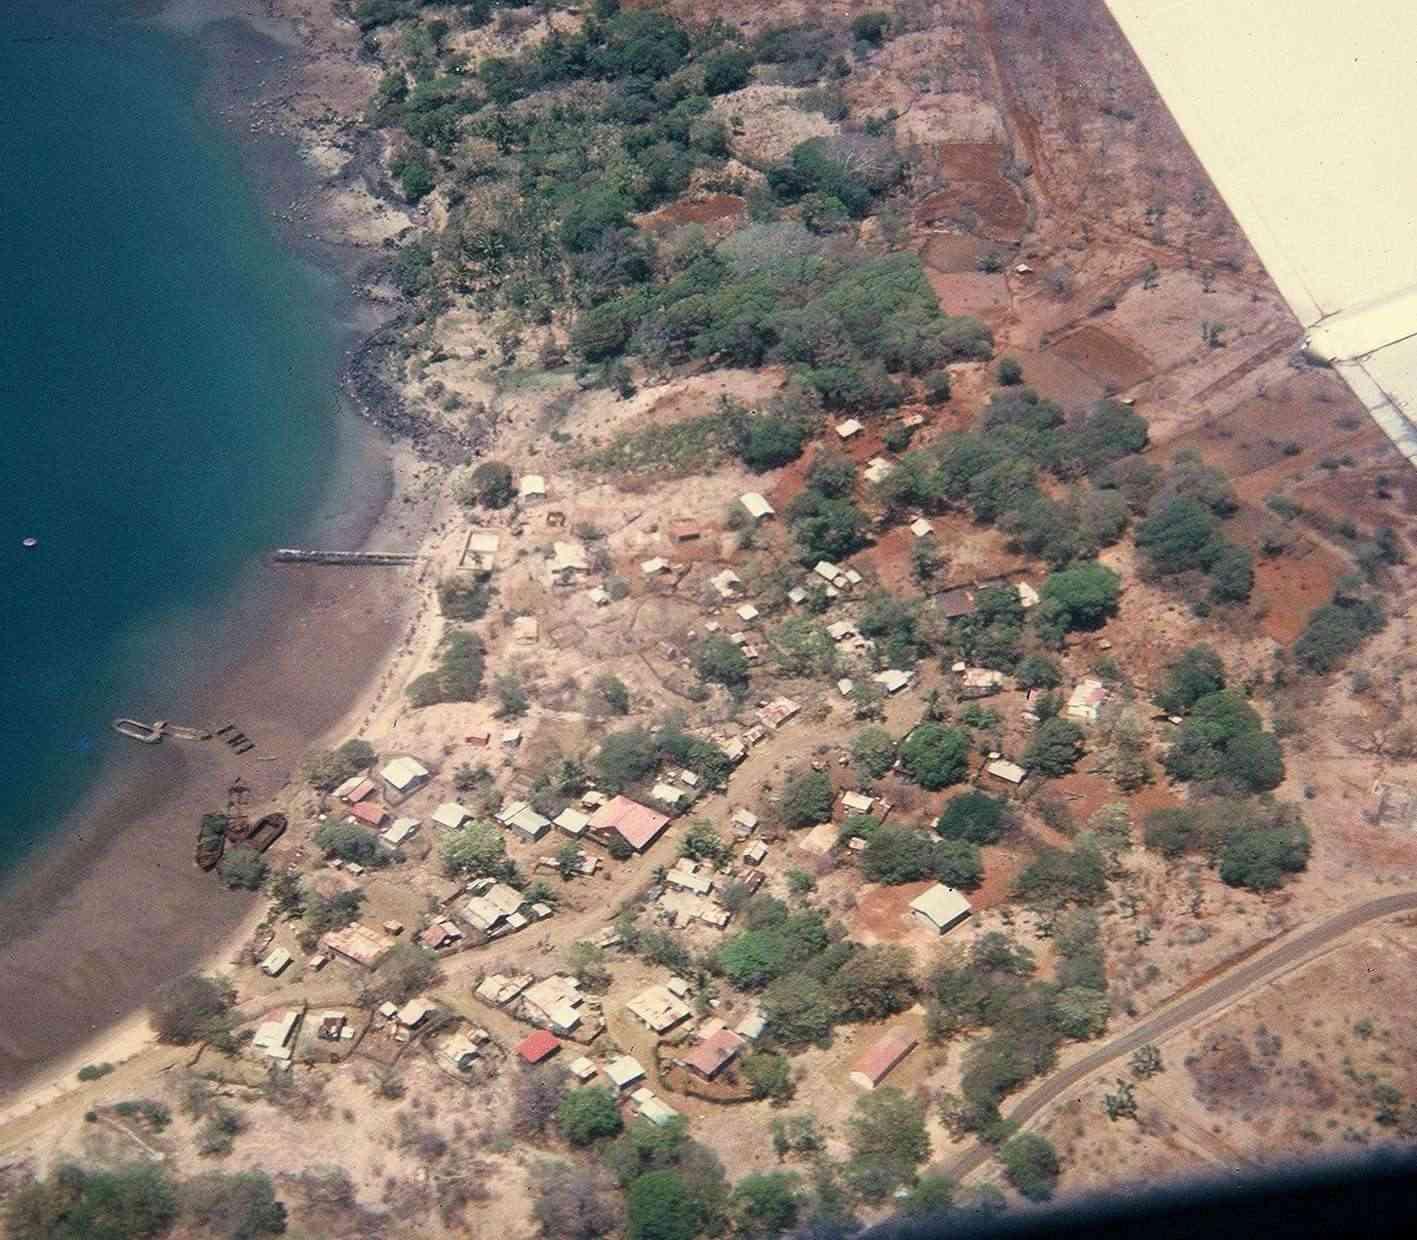 [Divers campagne Madagascar] CAP DIEGO AU CID 1972 - Page 3 Cd1_pa36